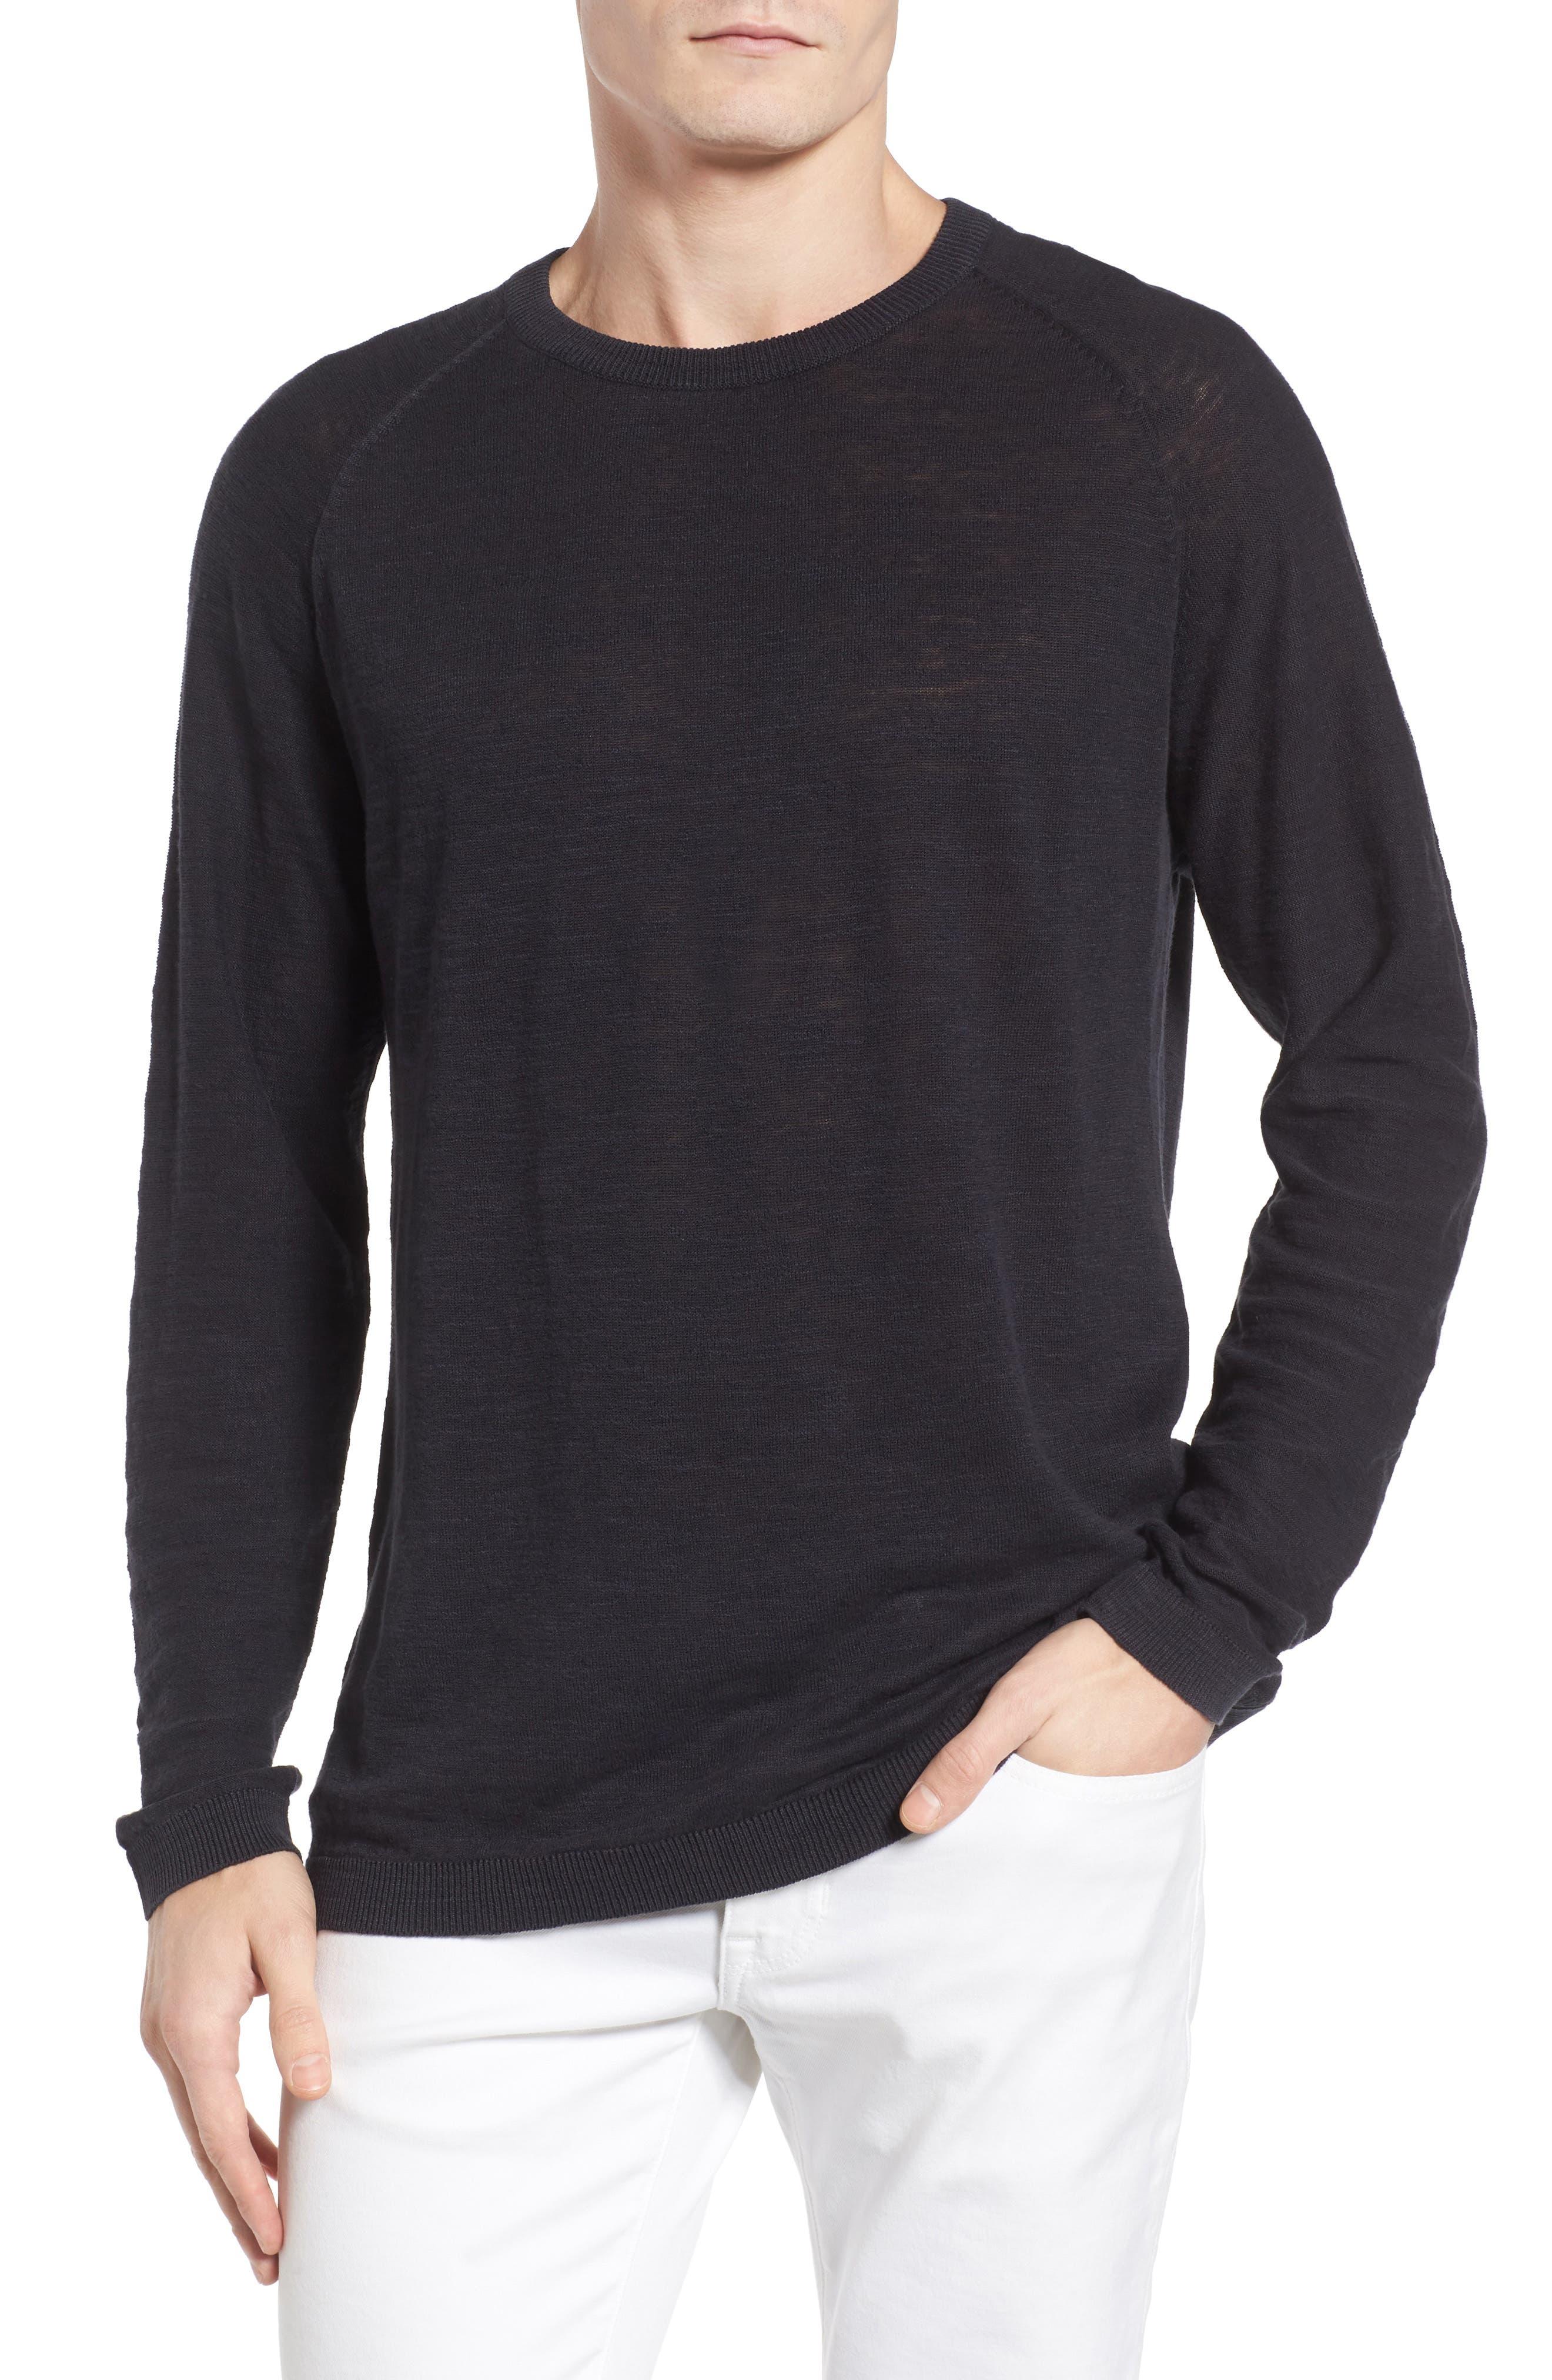 Arambol Cotton & Linen Sweater,                             Main thumbnail 1, color,                             409